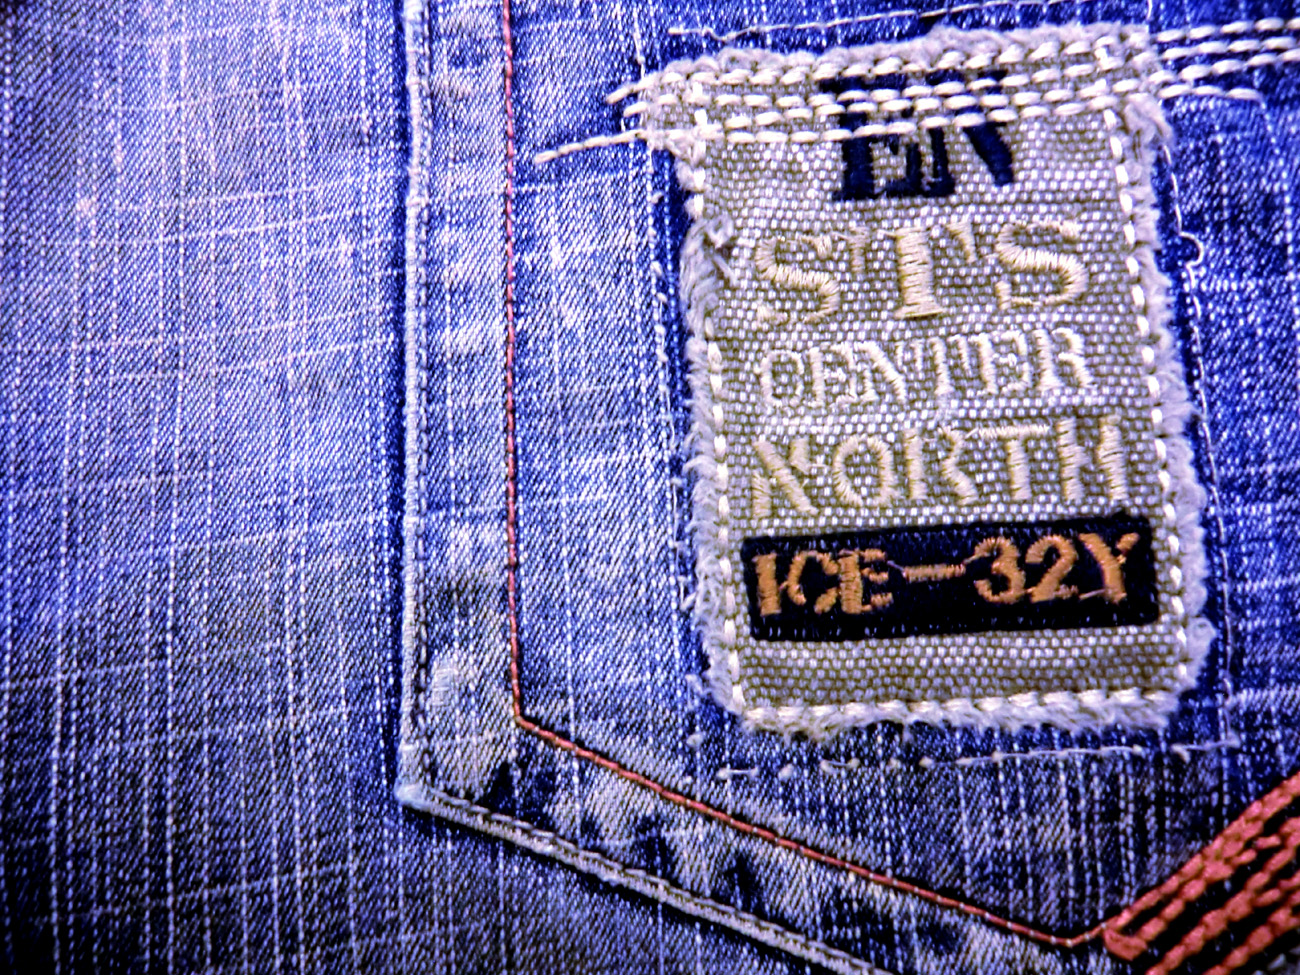 http://4.bp.blogspot.com/-7JP0_N-k6P0/TuiC7-1w1hI/AAAAAAAAY9M/uKYtLTaIxIo/s1600/Gruge+Jeans+Wallpapers+%25287%2529.jpg